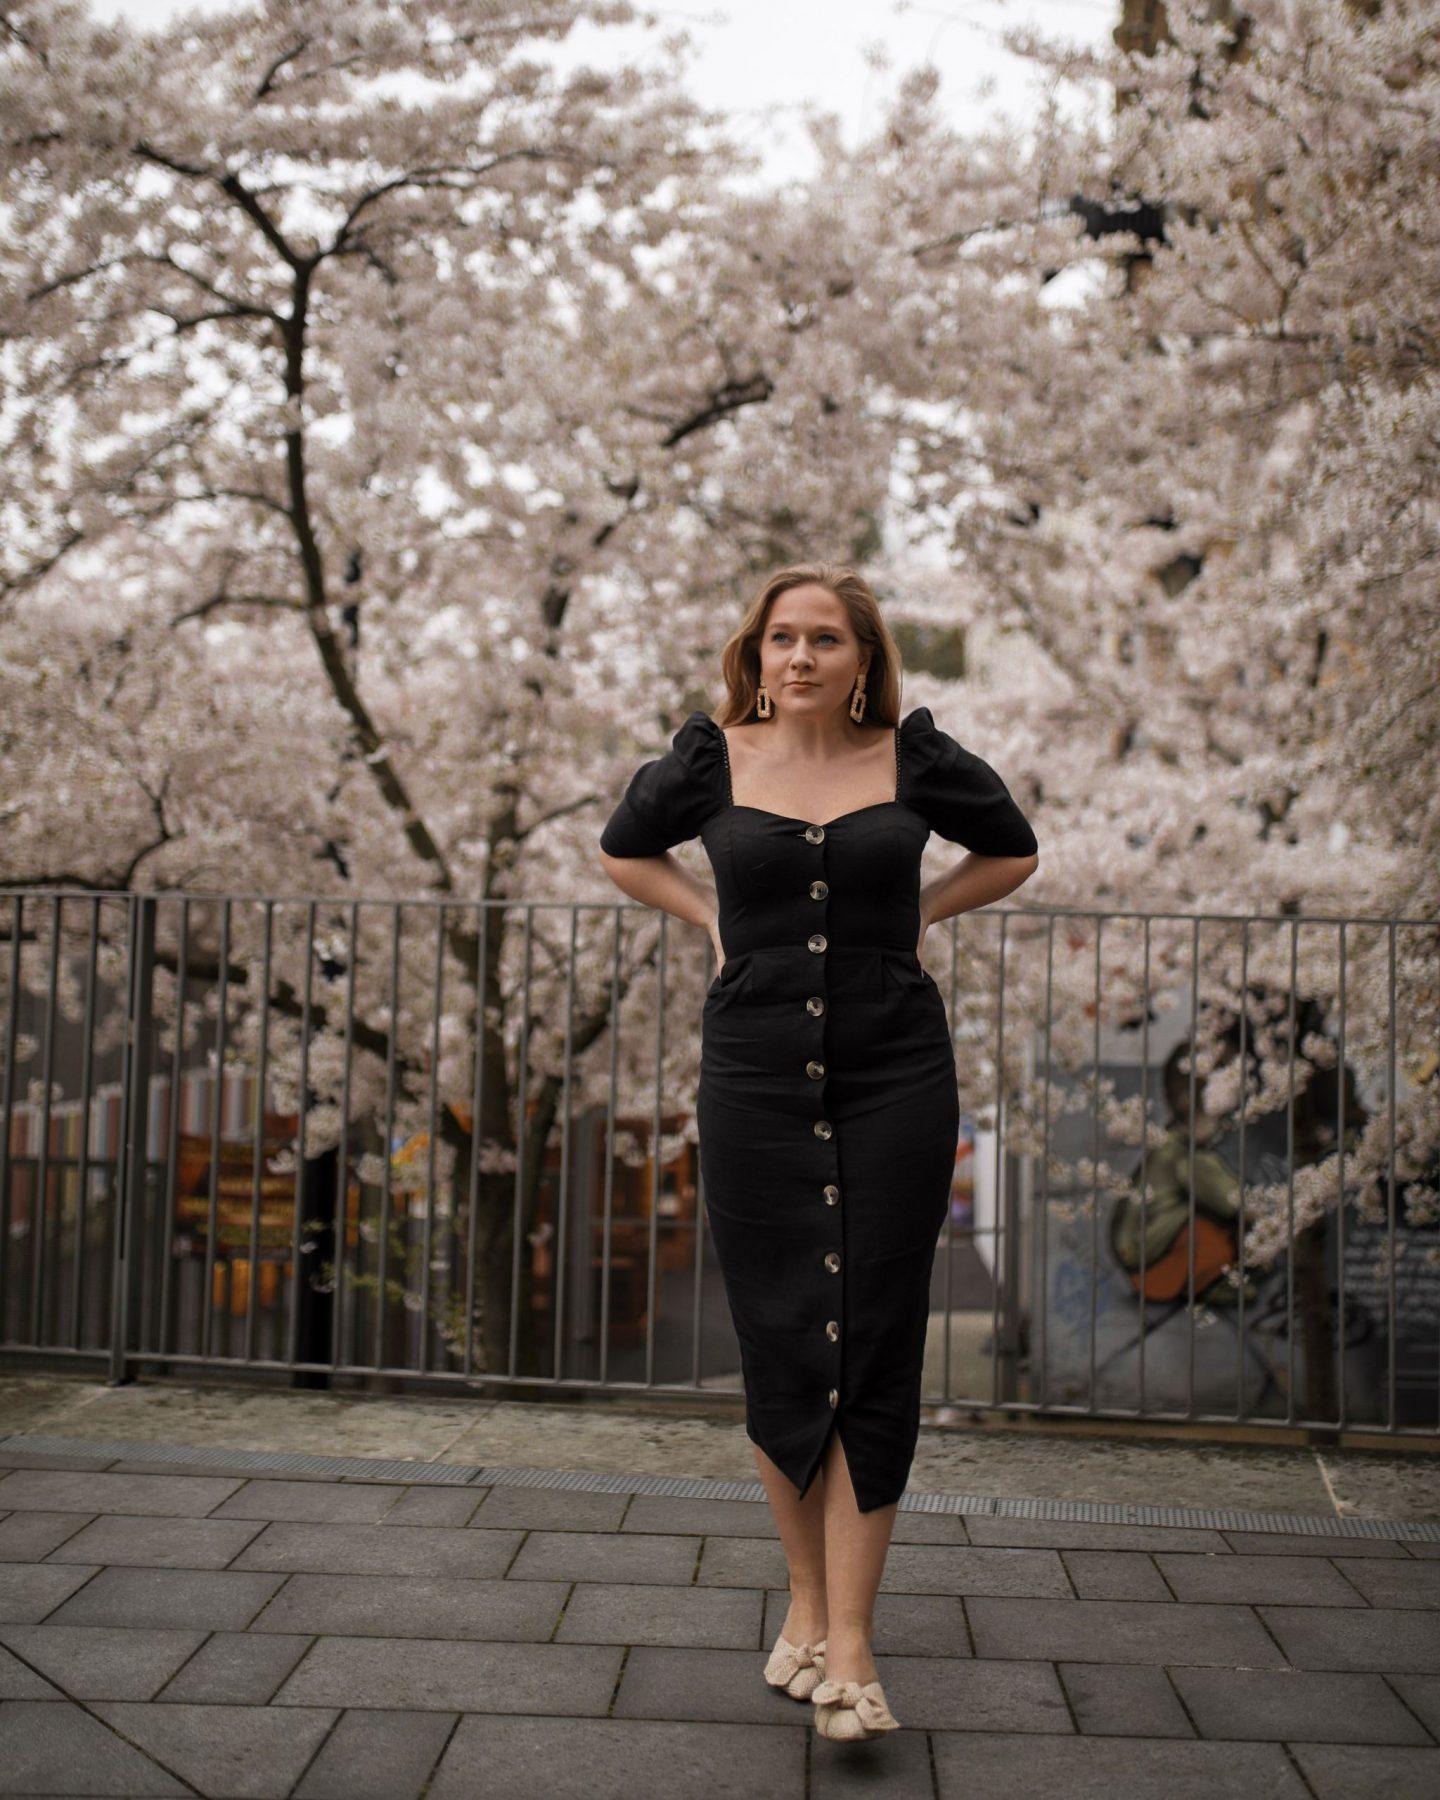 Black Cherry Blossom in spring